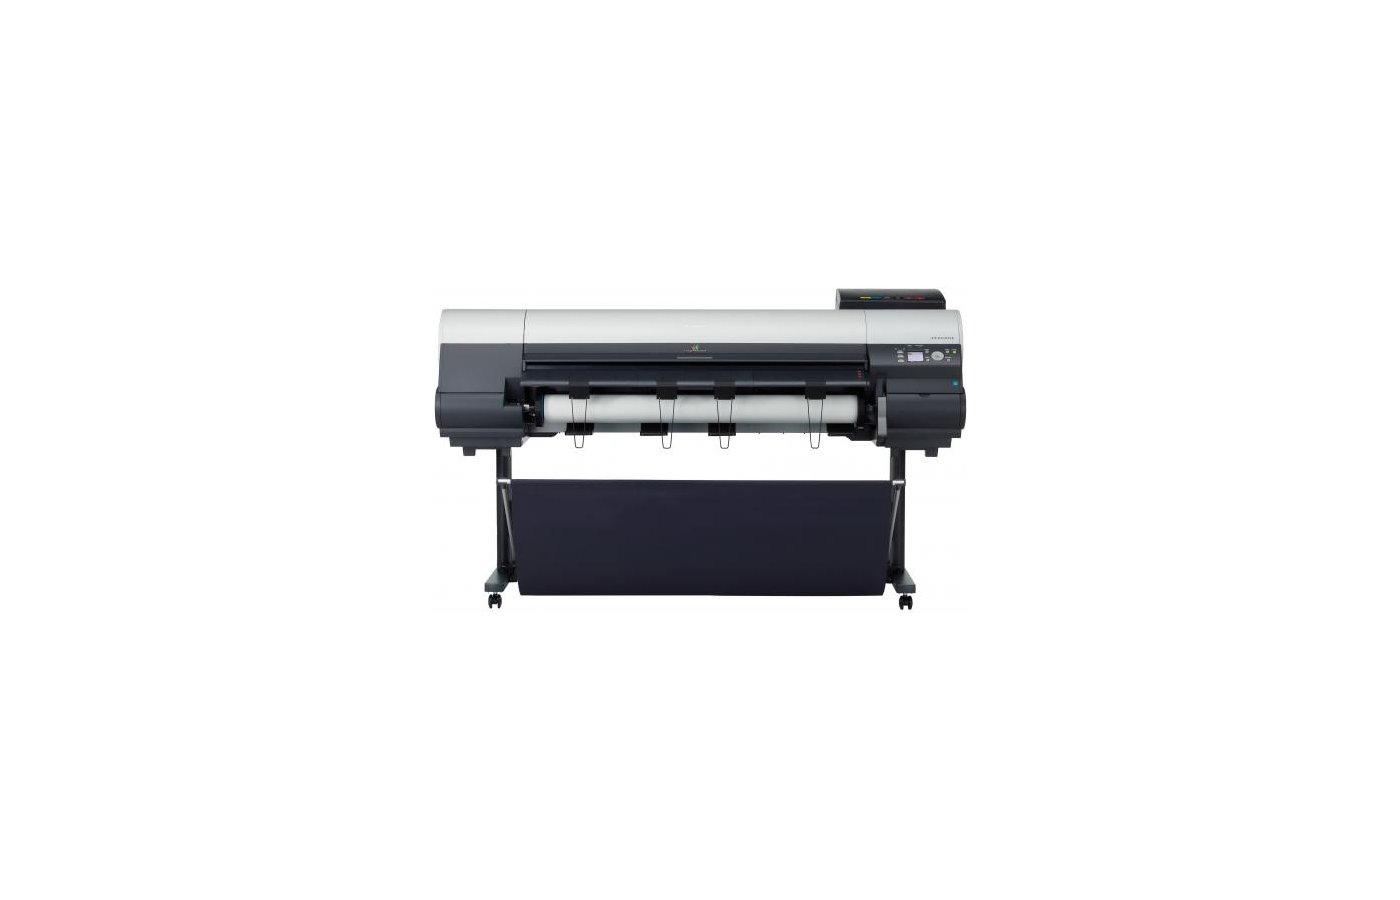 Принтер Canon imagePROGRAF iPF8400SE /8572B003/